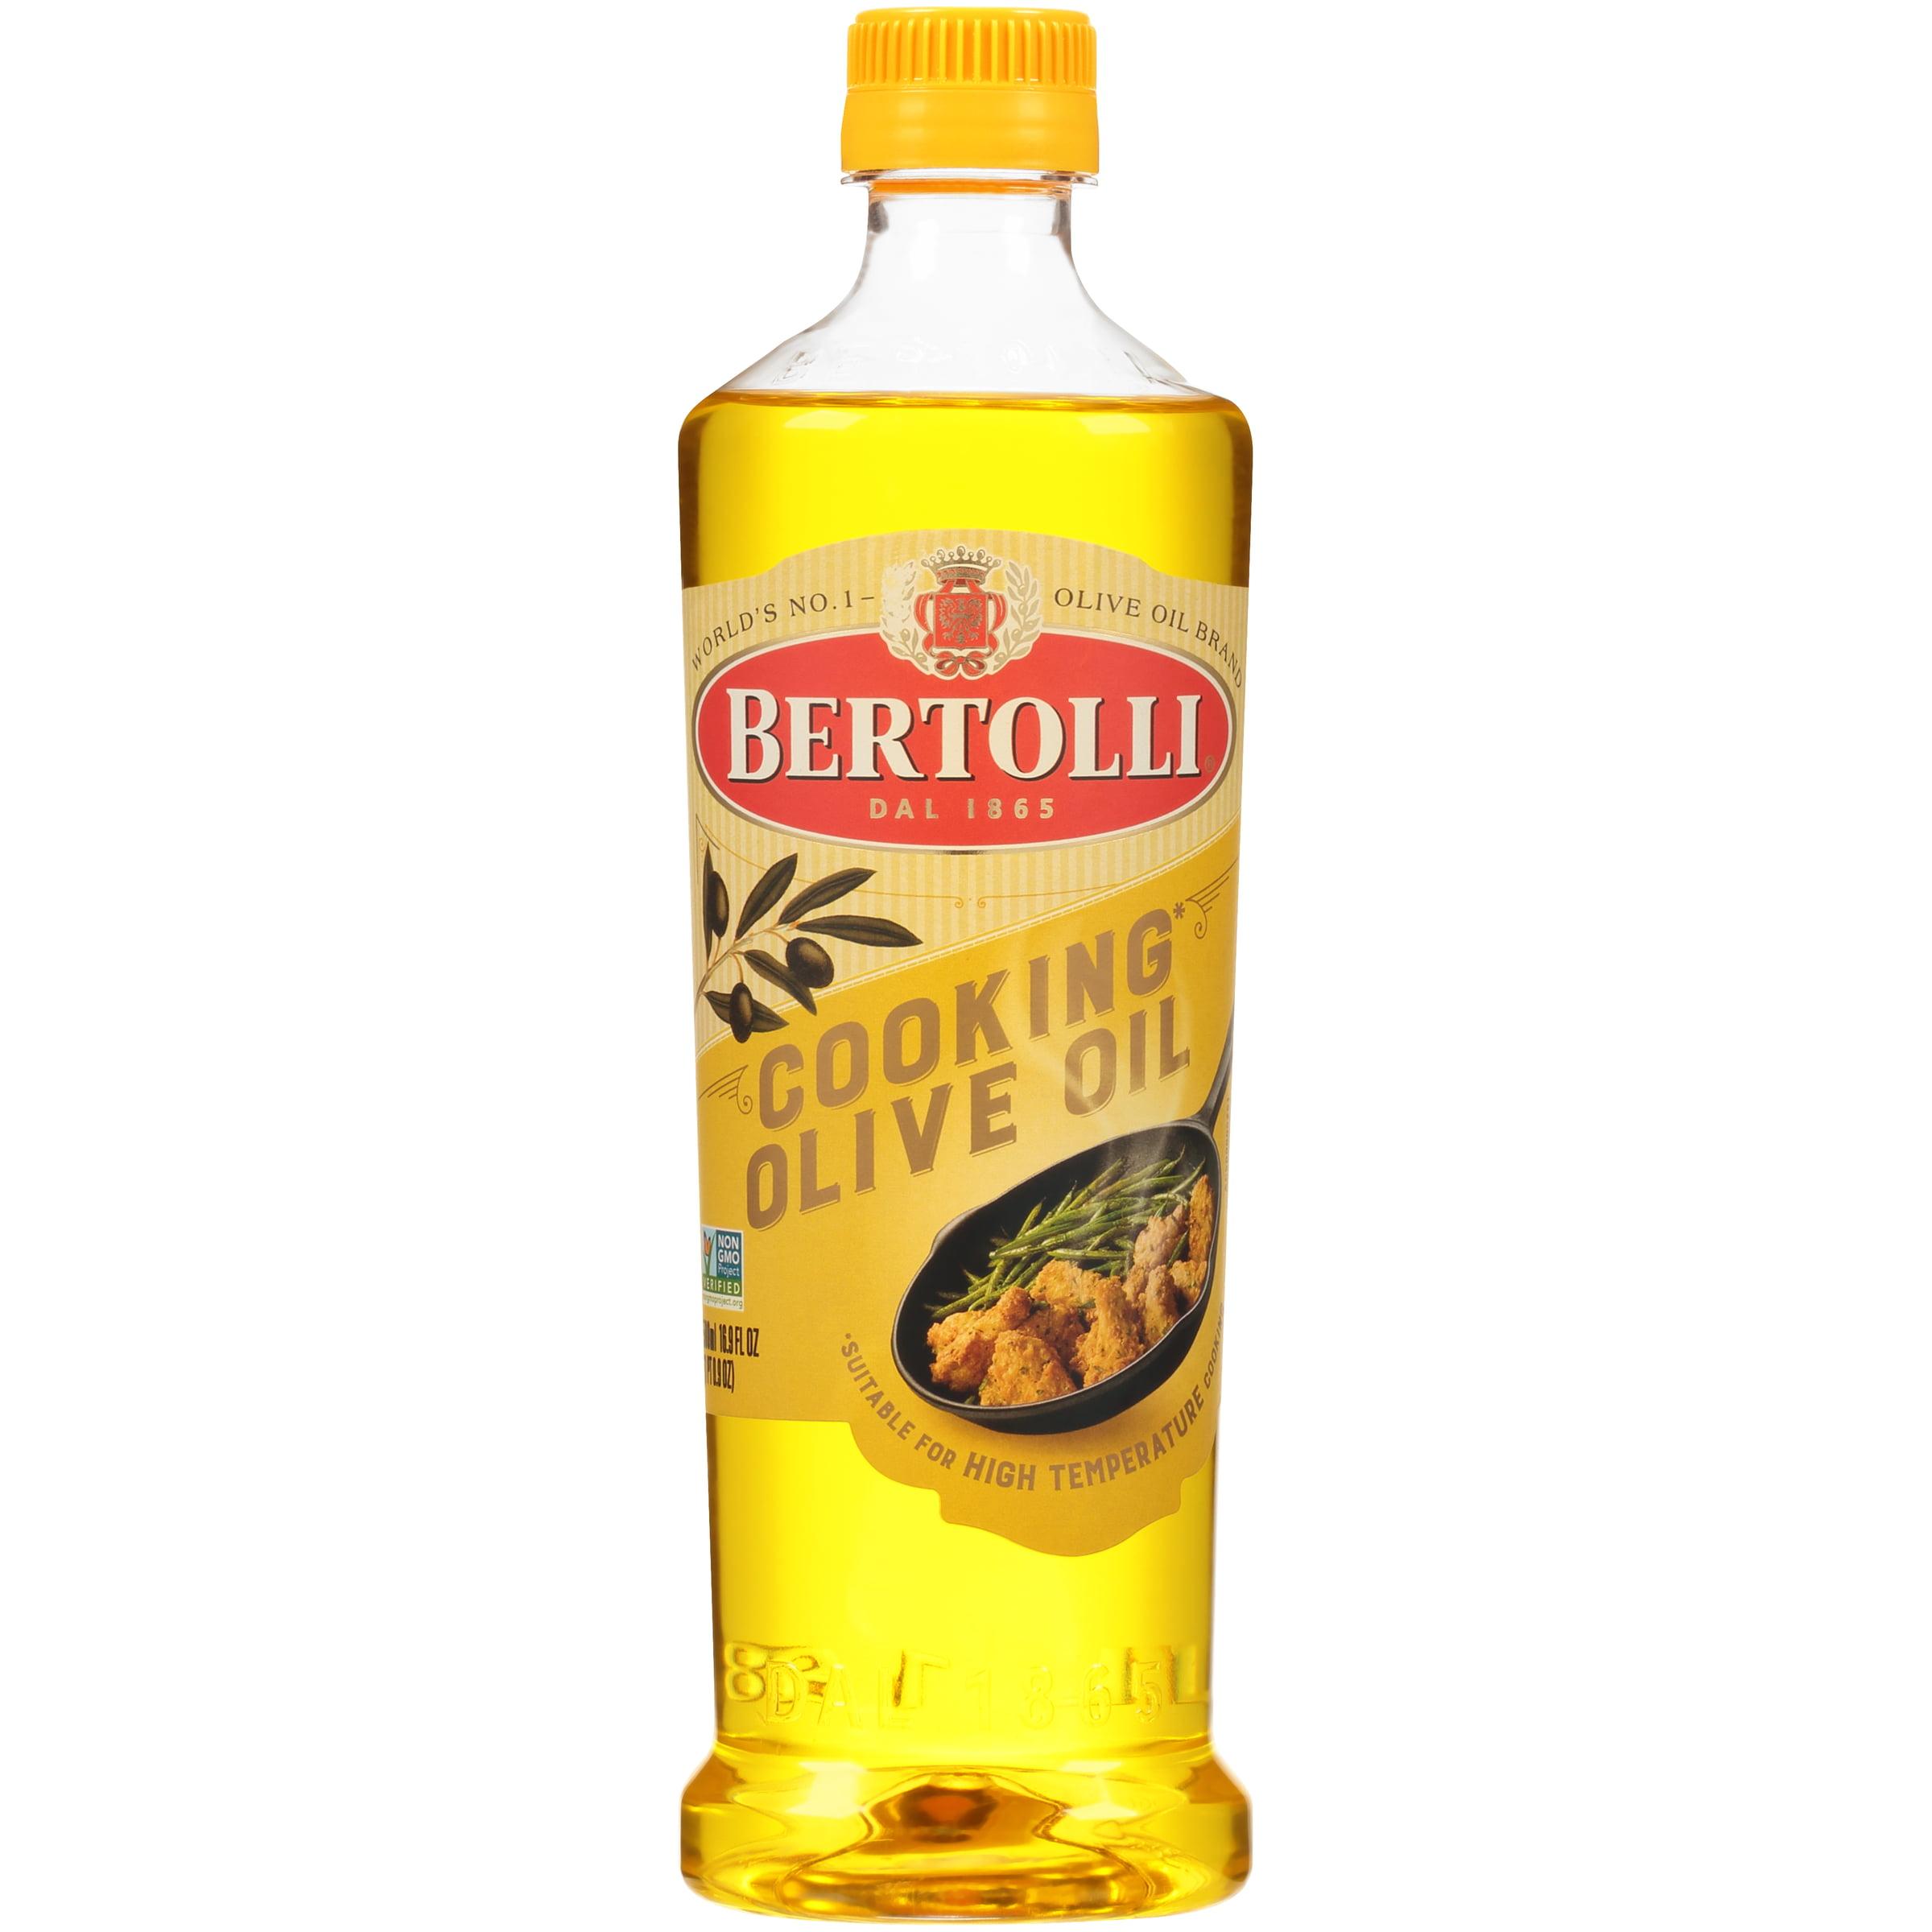 Bertolli Cooking Olive Oil, 17 oz